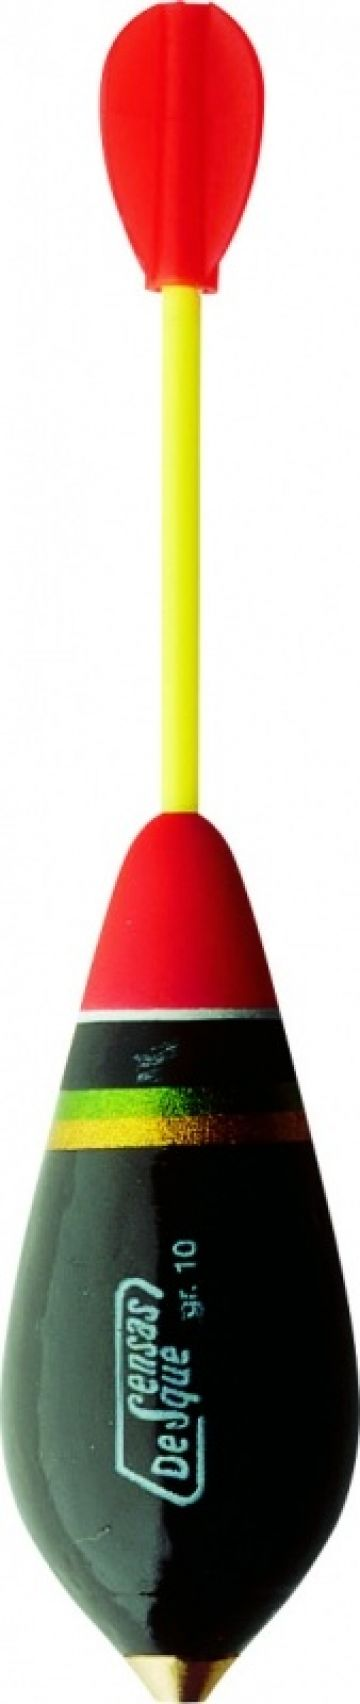 Sensas Bombetta Marie zwart - rood - geel roofvis visdobber 30g